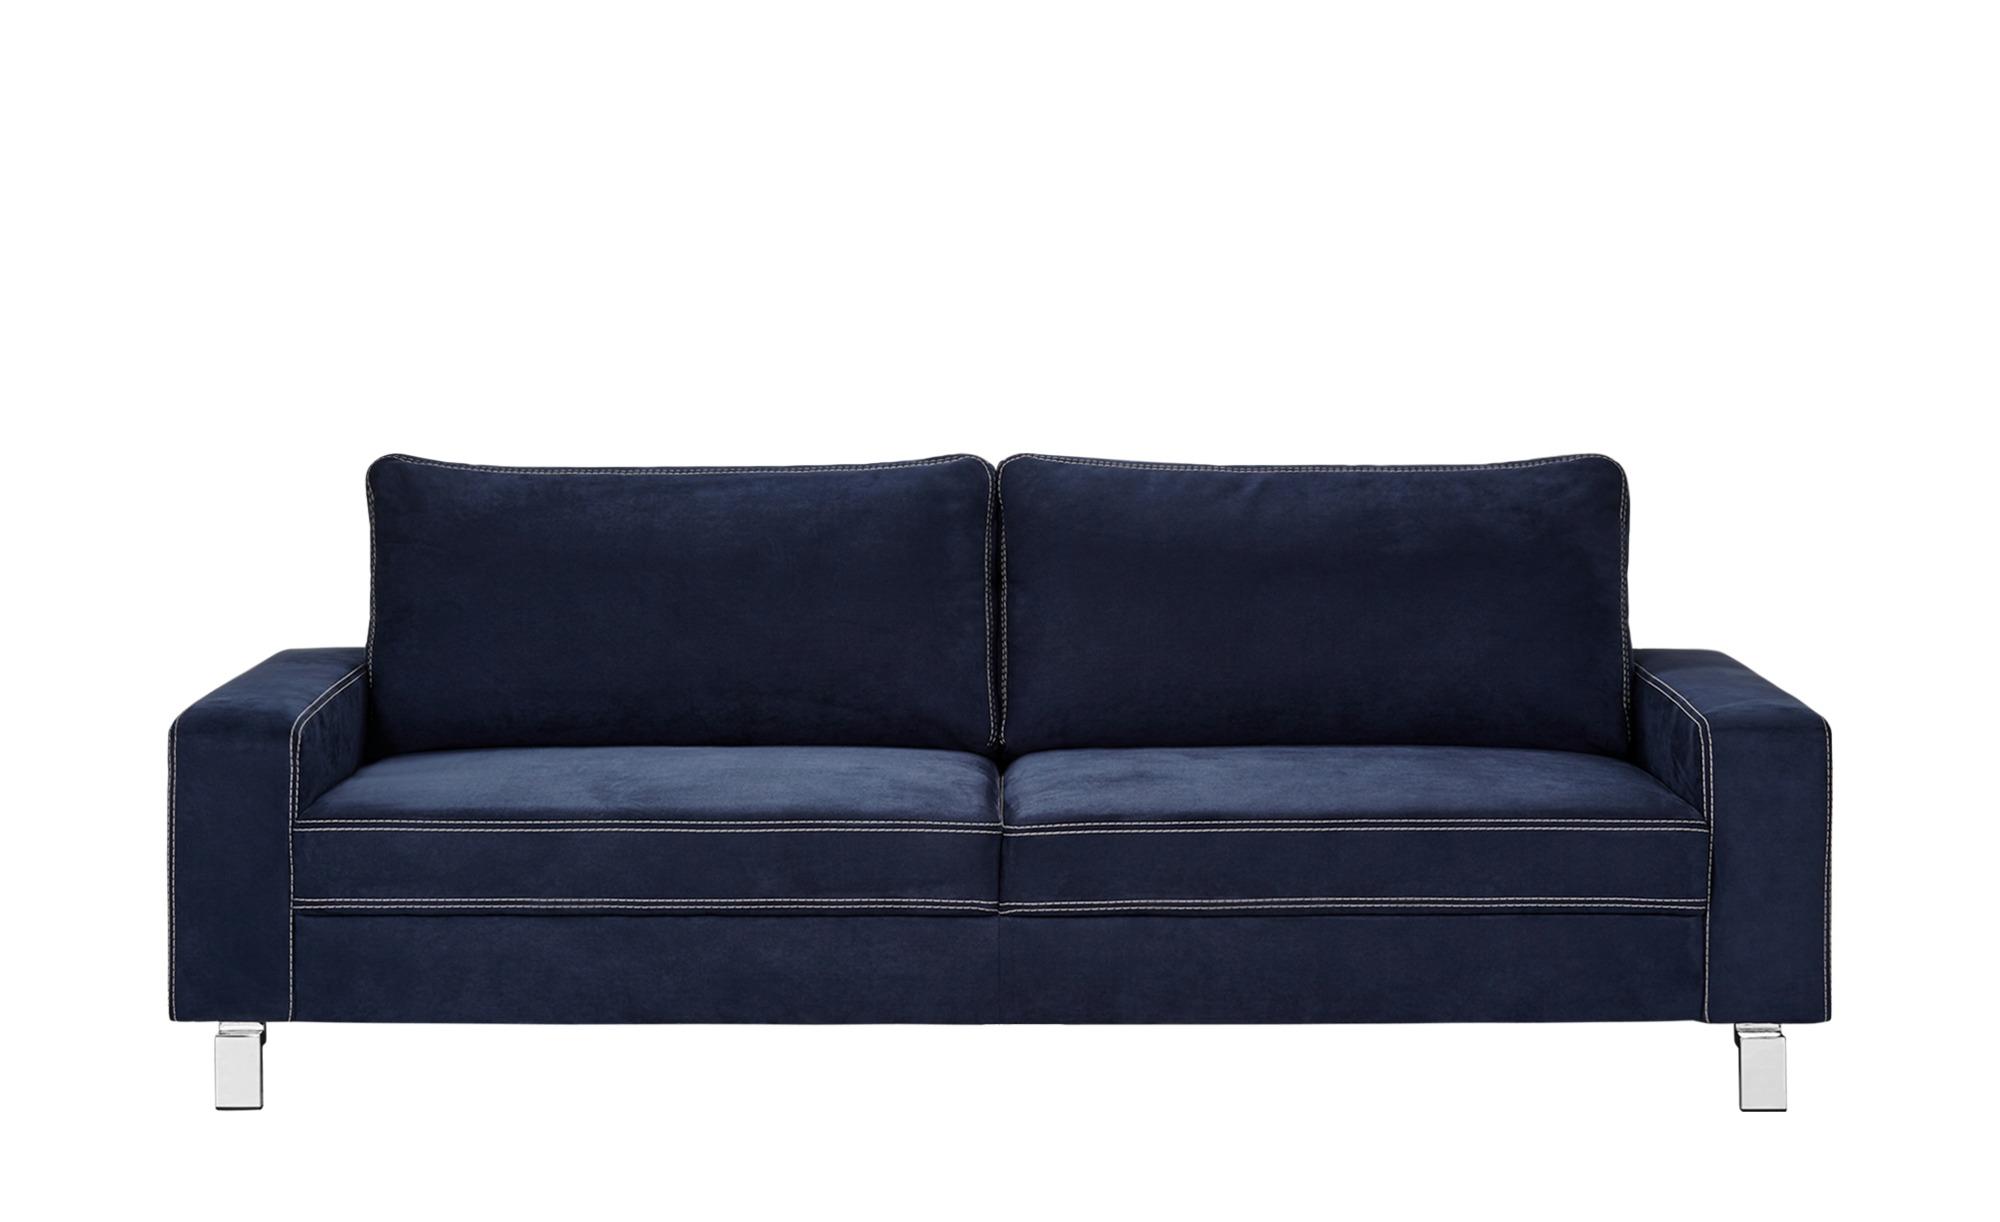 Sofa dunkelblau - Mikrofaser Coline ¦ blau ¦ Maße (cm): B: 218 H: 83 T: 97 Polstermöbel > Sofas > 3-Sitzer - Höffner